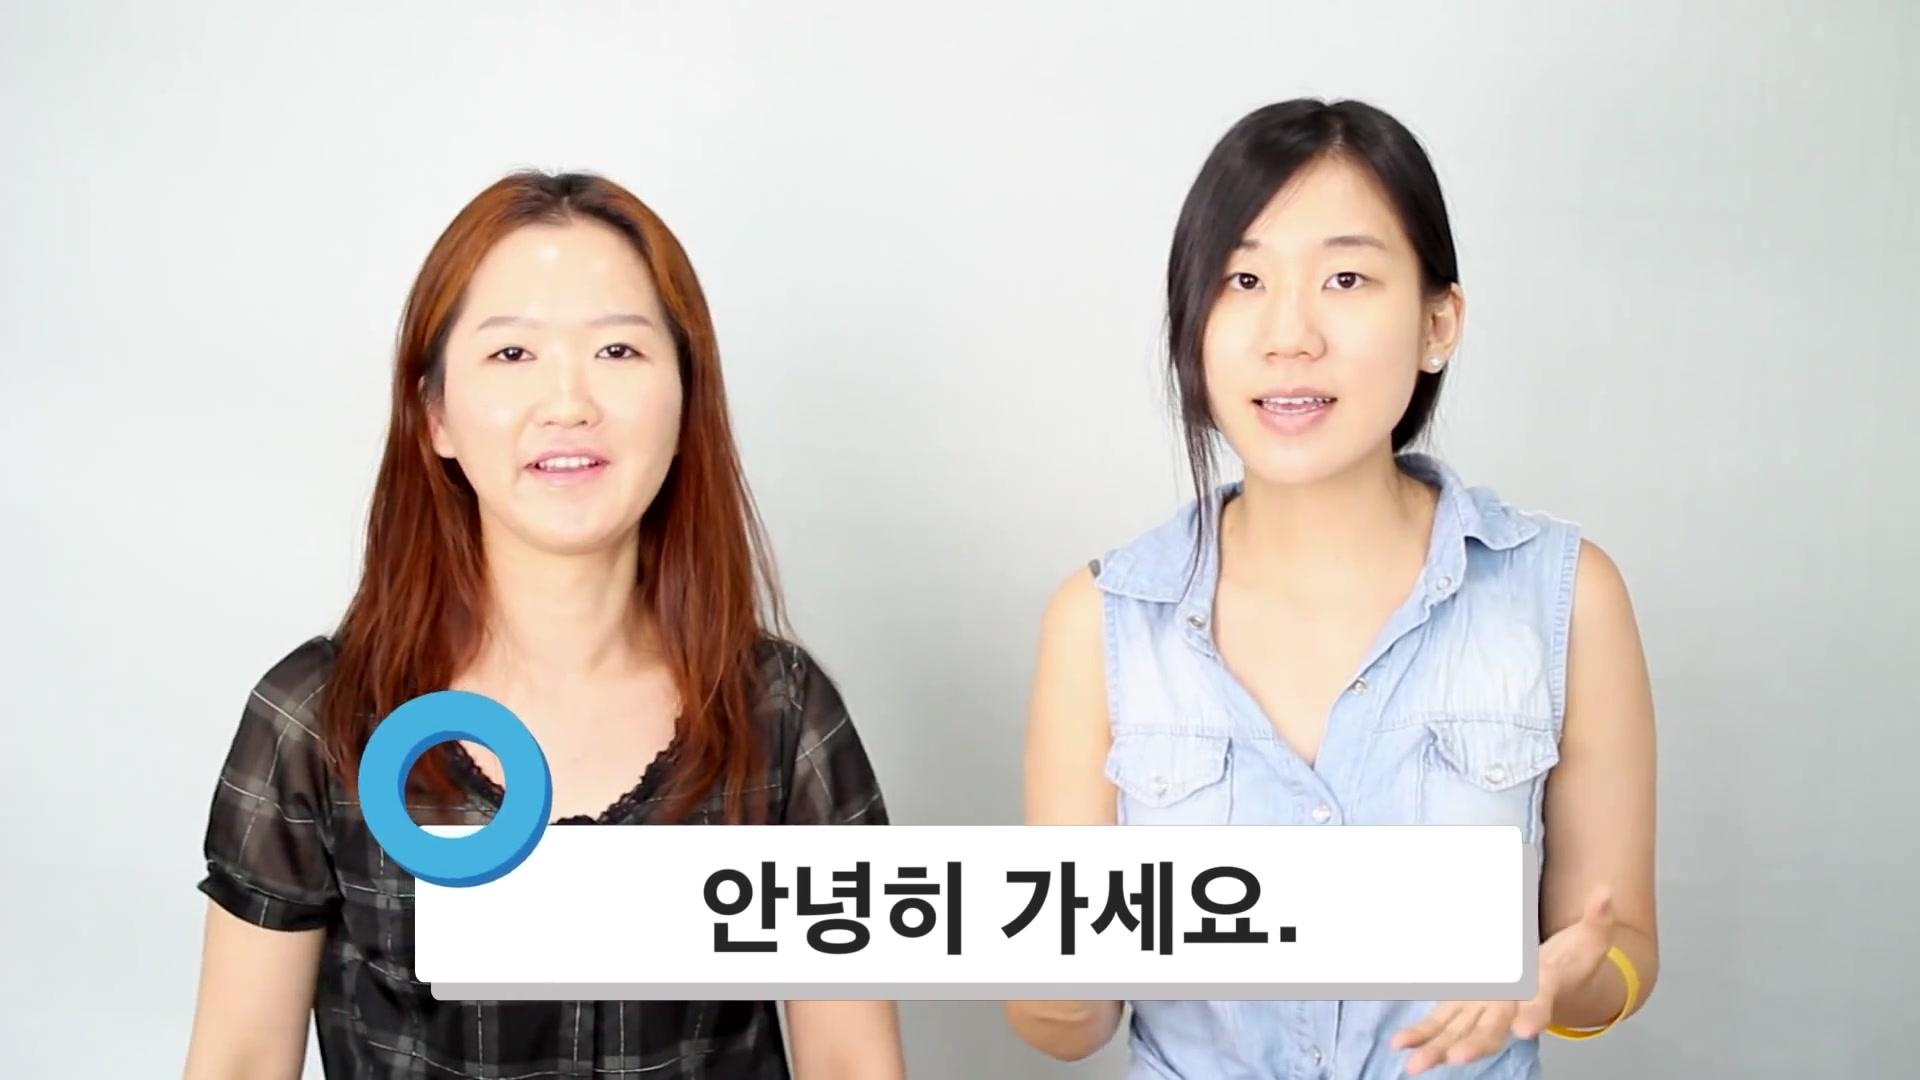 TalkToMeInKorean Episode 143: How NOT to Say 'Take Care' in Korean